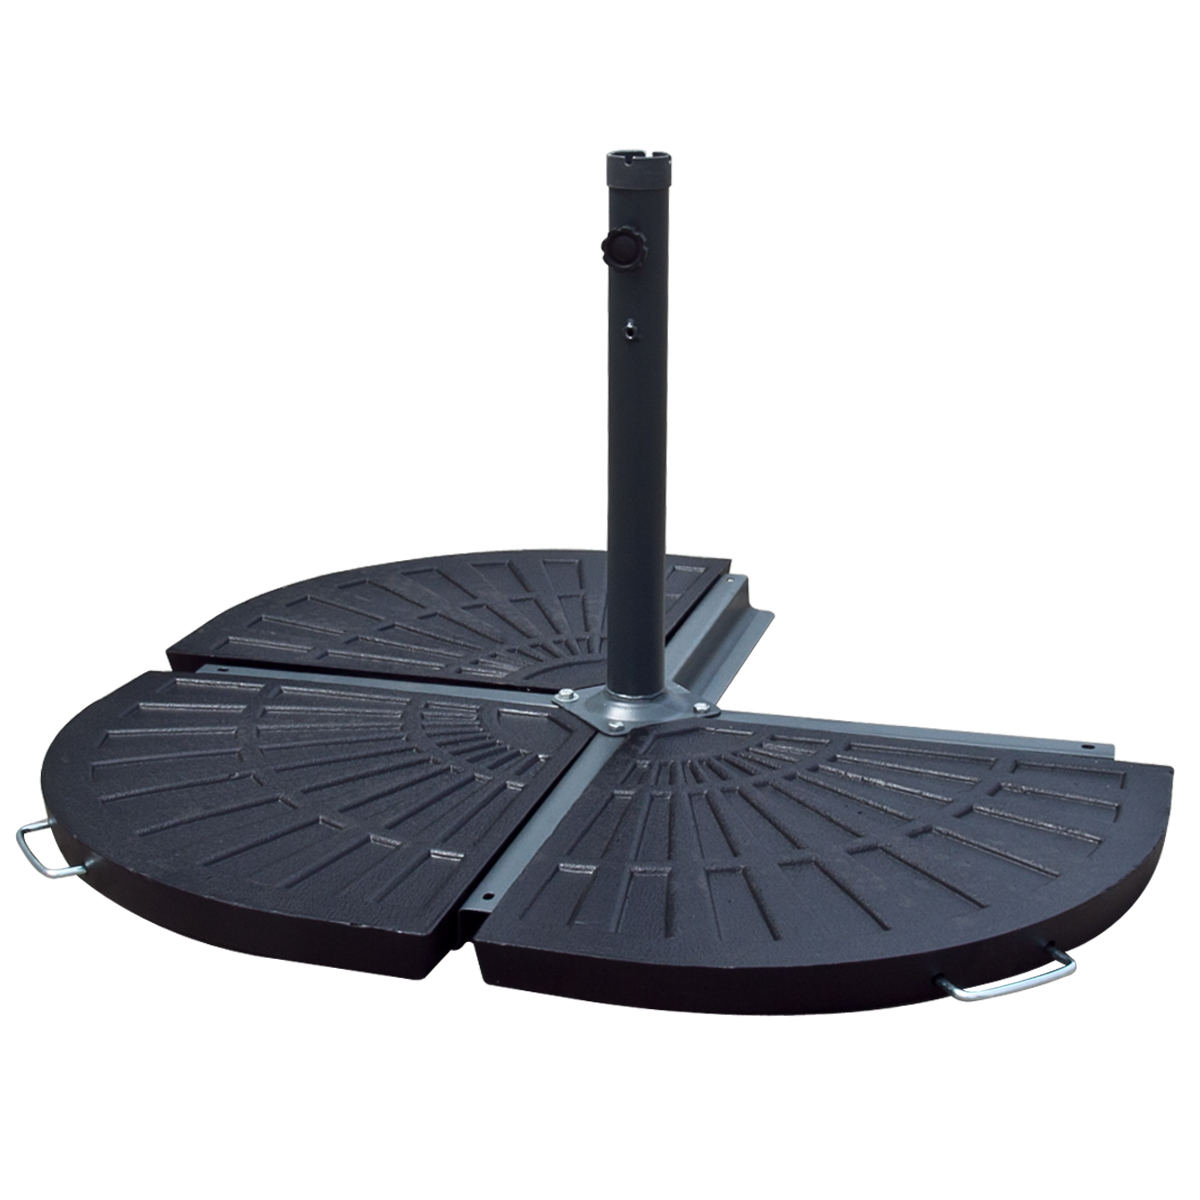 Patio Umbrella With Base: Patio Umbrella Stand Vintage Finish Outdoor Table Pole 30